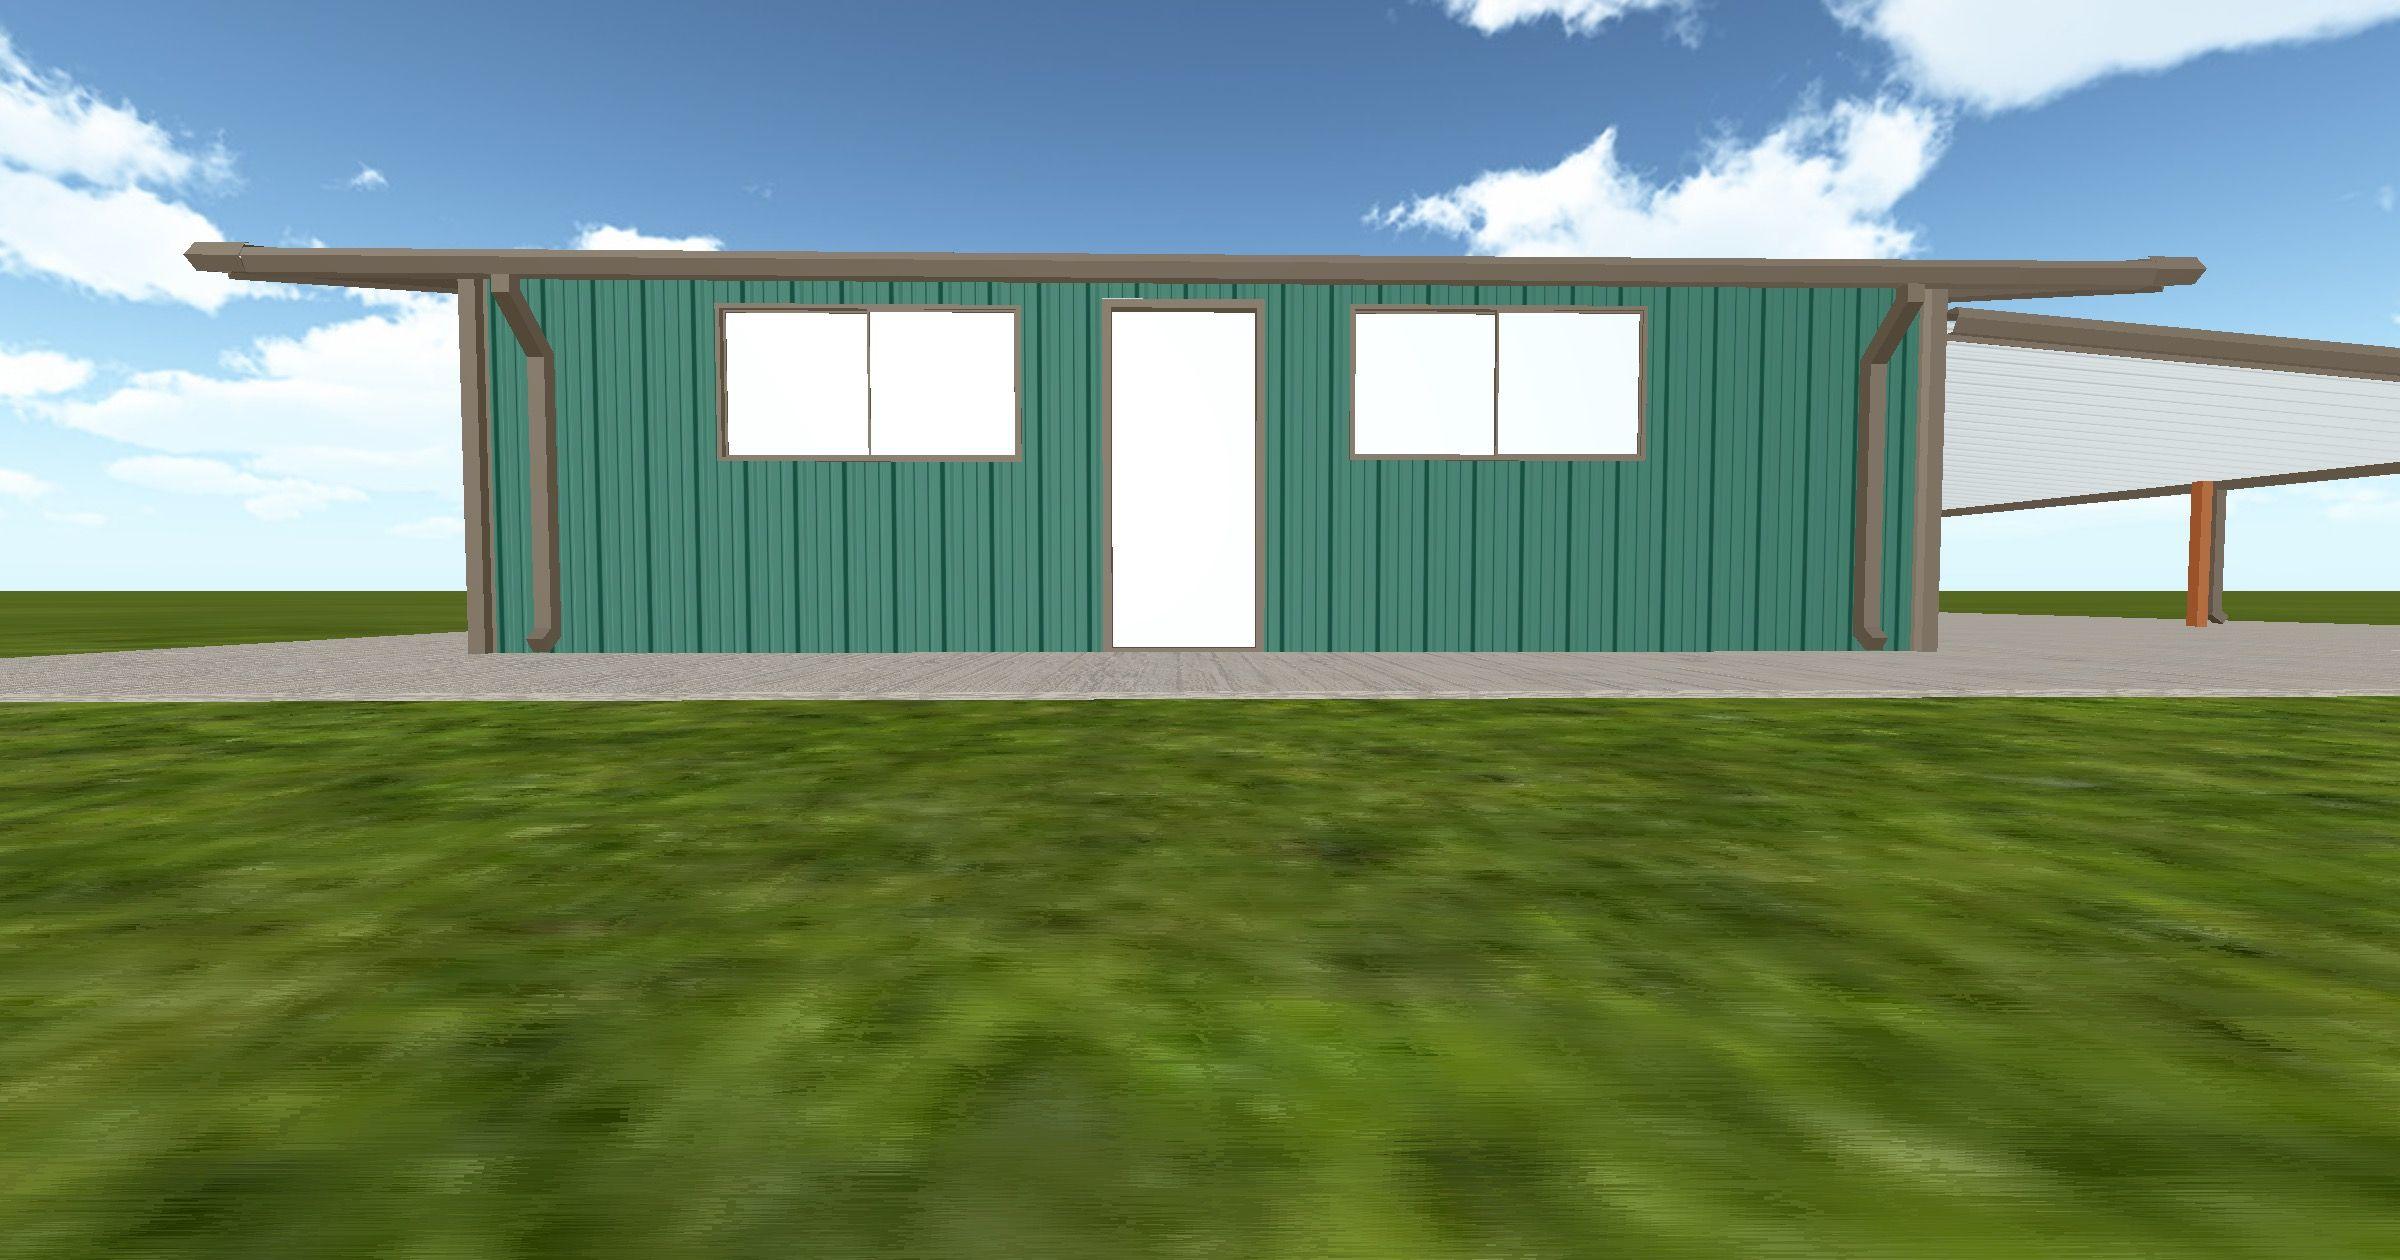 #3D #Building built using #Viral3D web-based #design tool http://ift.tt/1NasW33 #360 #virtual #construction